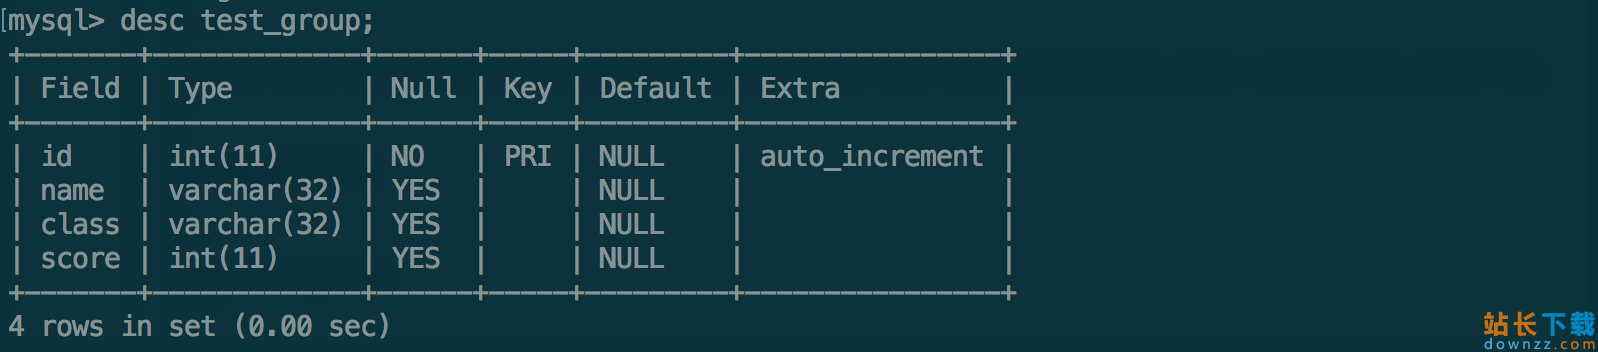 MYSQLGROUPBY用法<em style='color:red;'>详解</em>